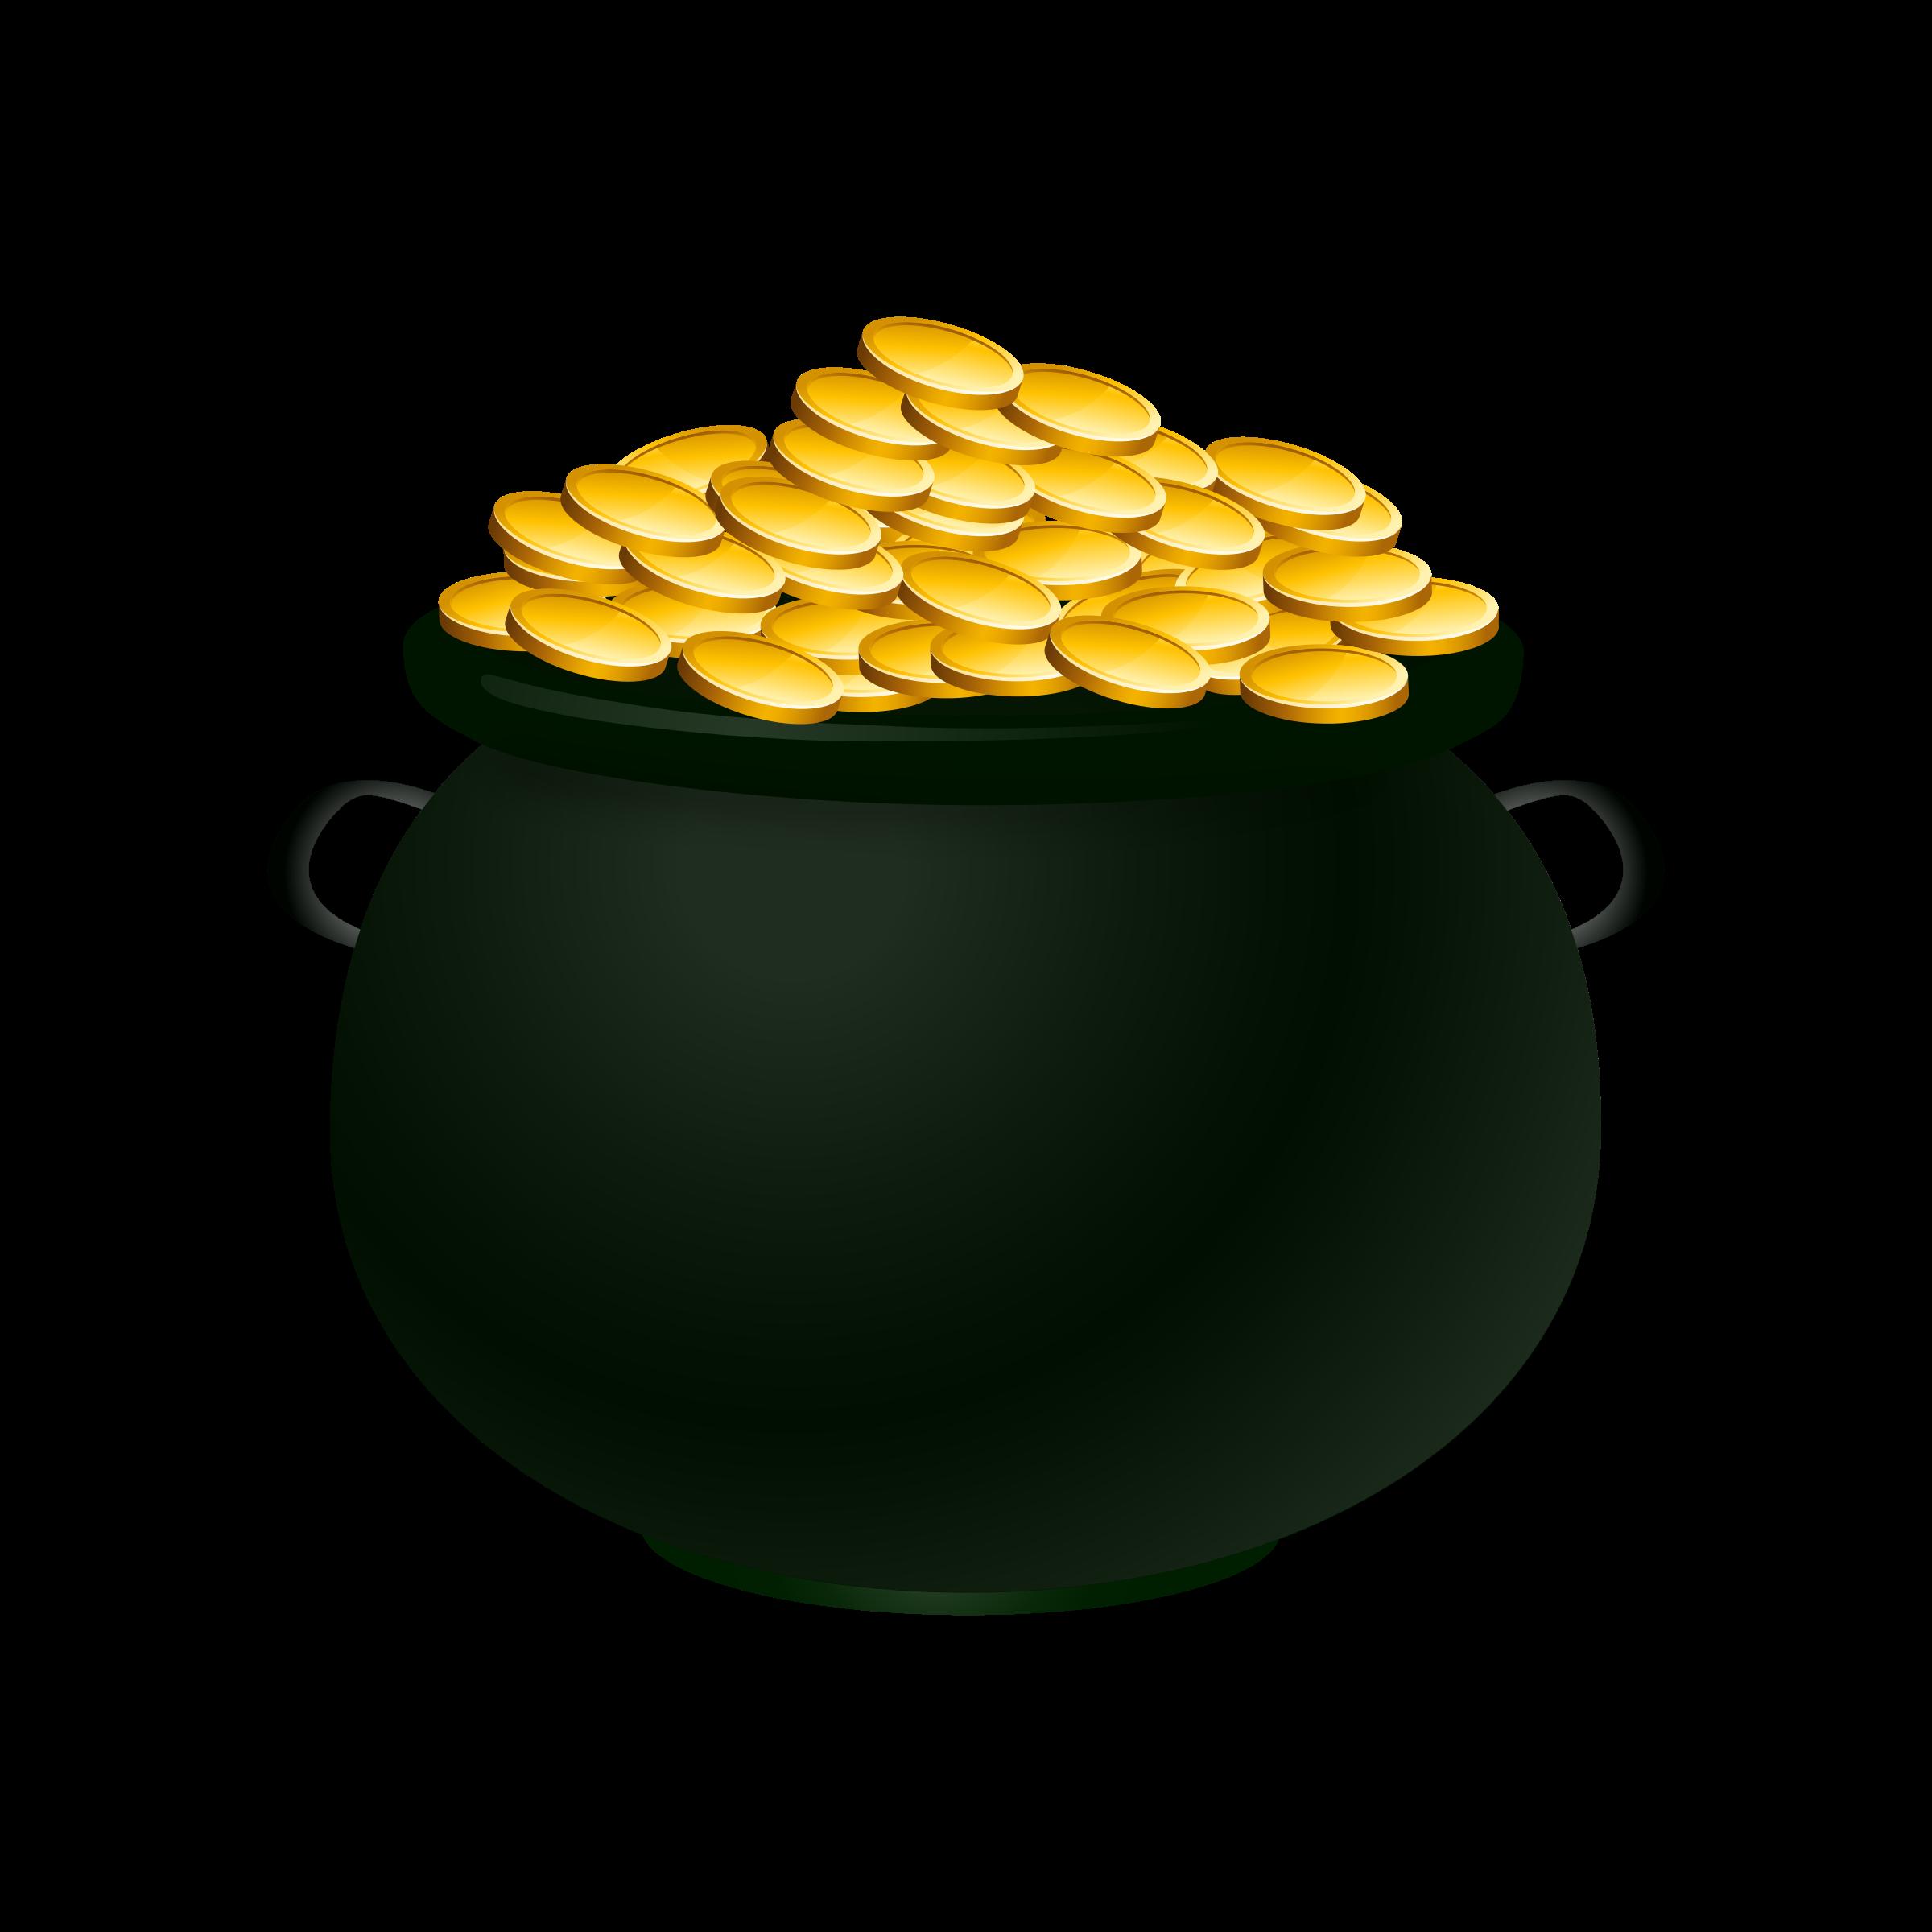 Gold Pot Clipart.